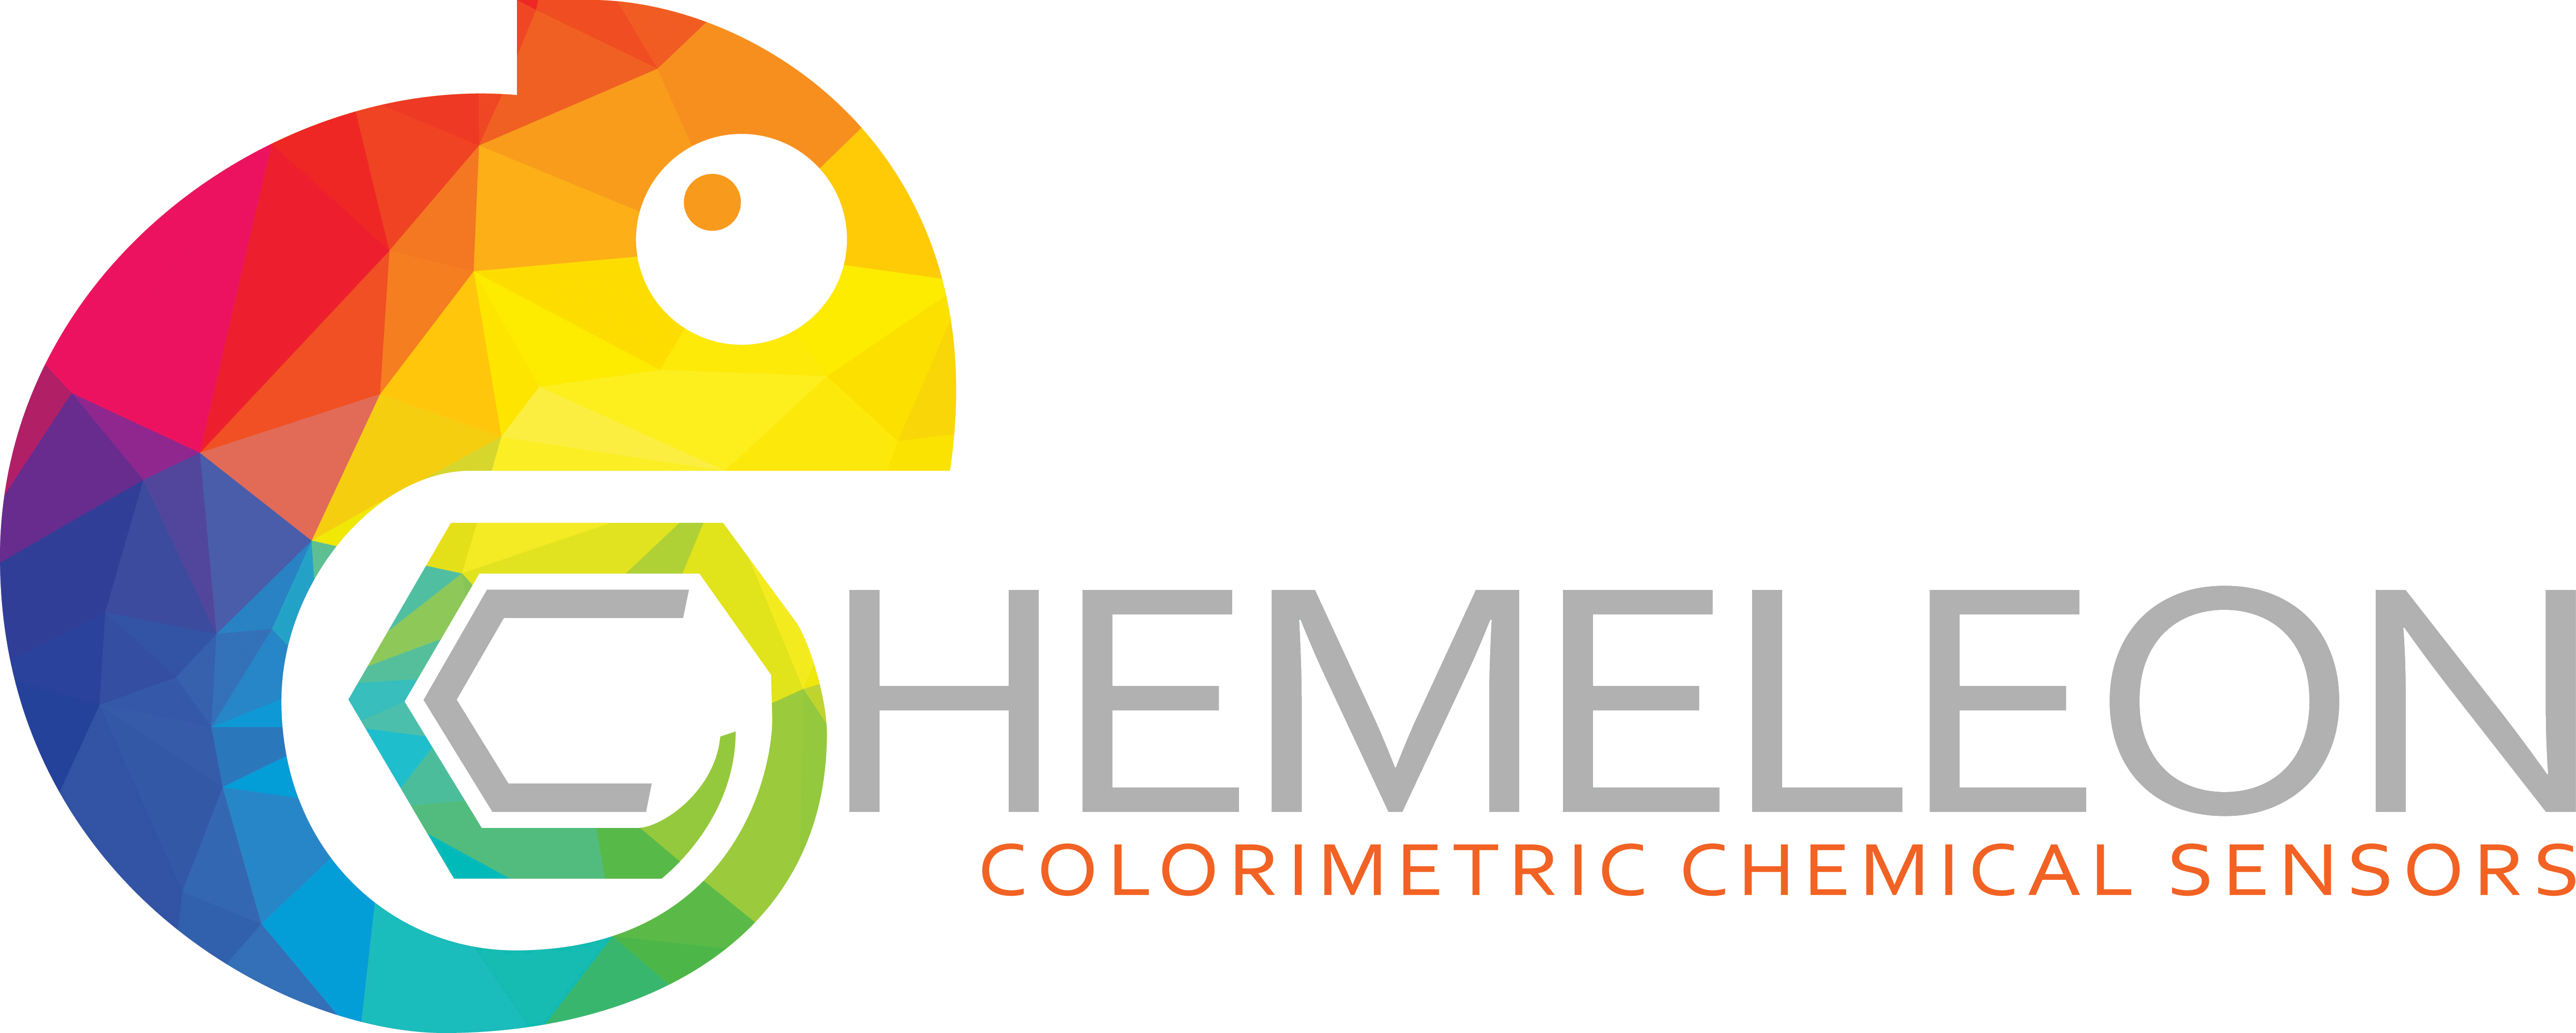 Chemeleon